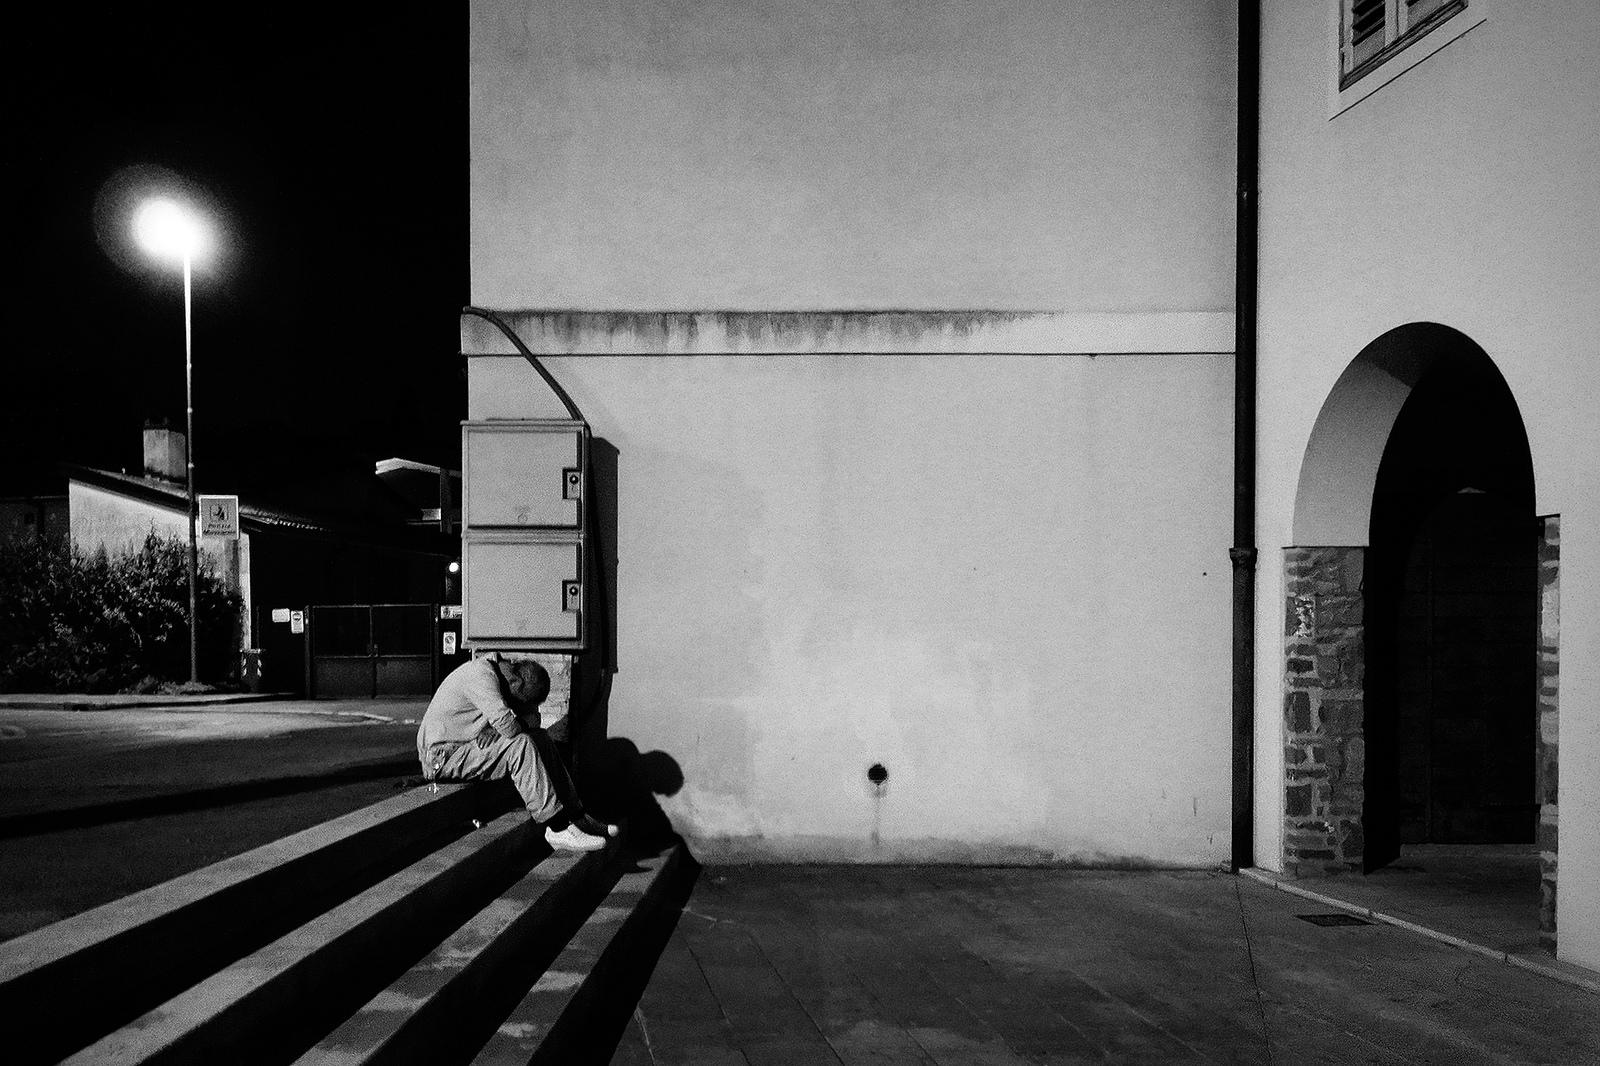 solitario iko